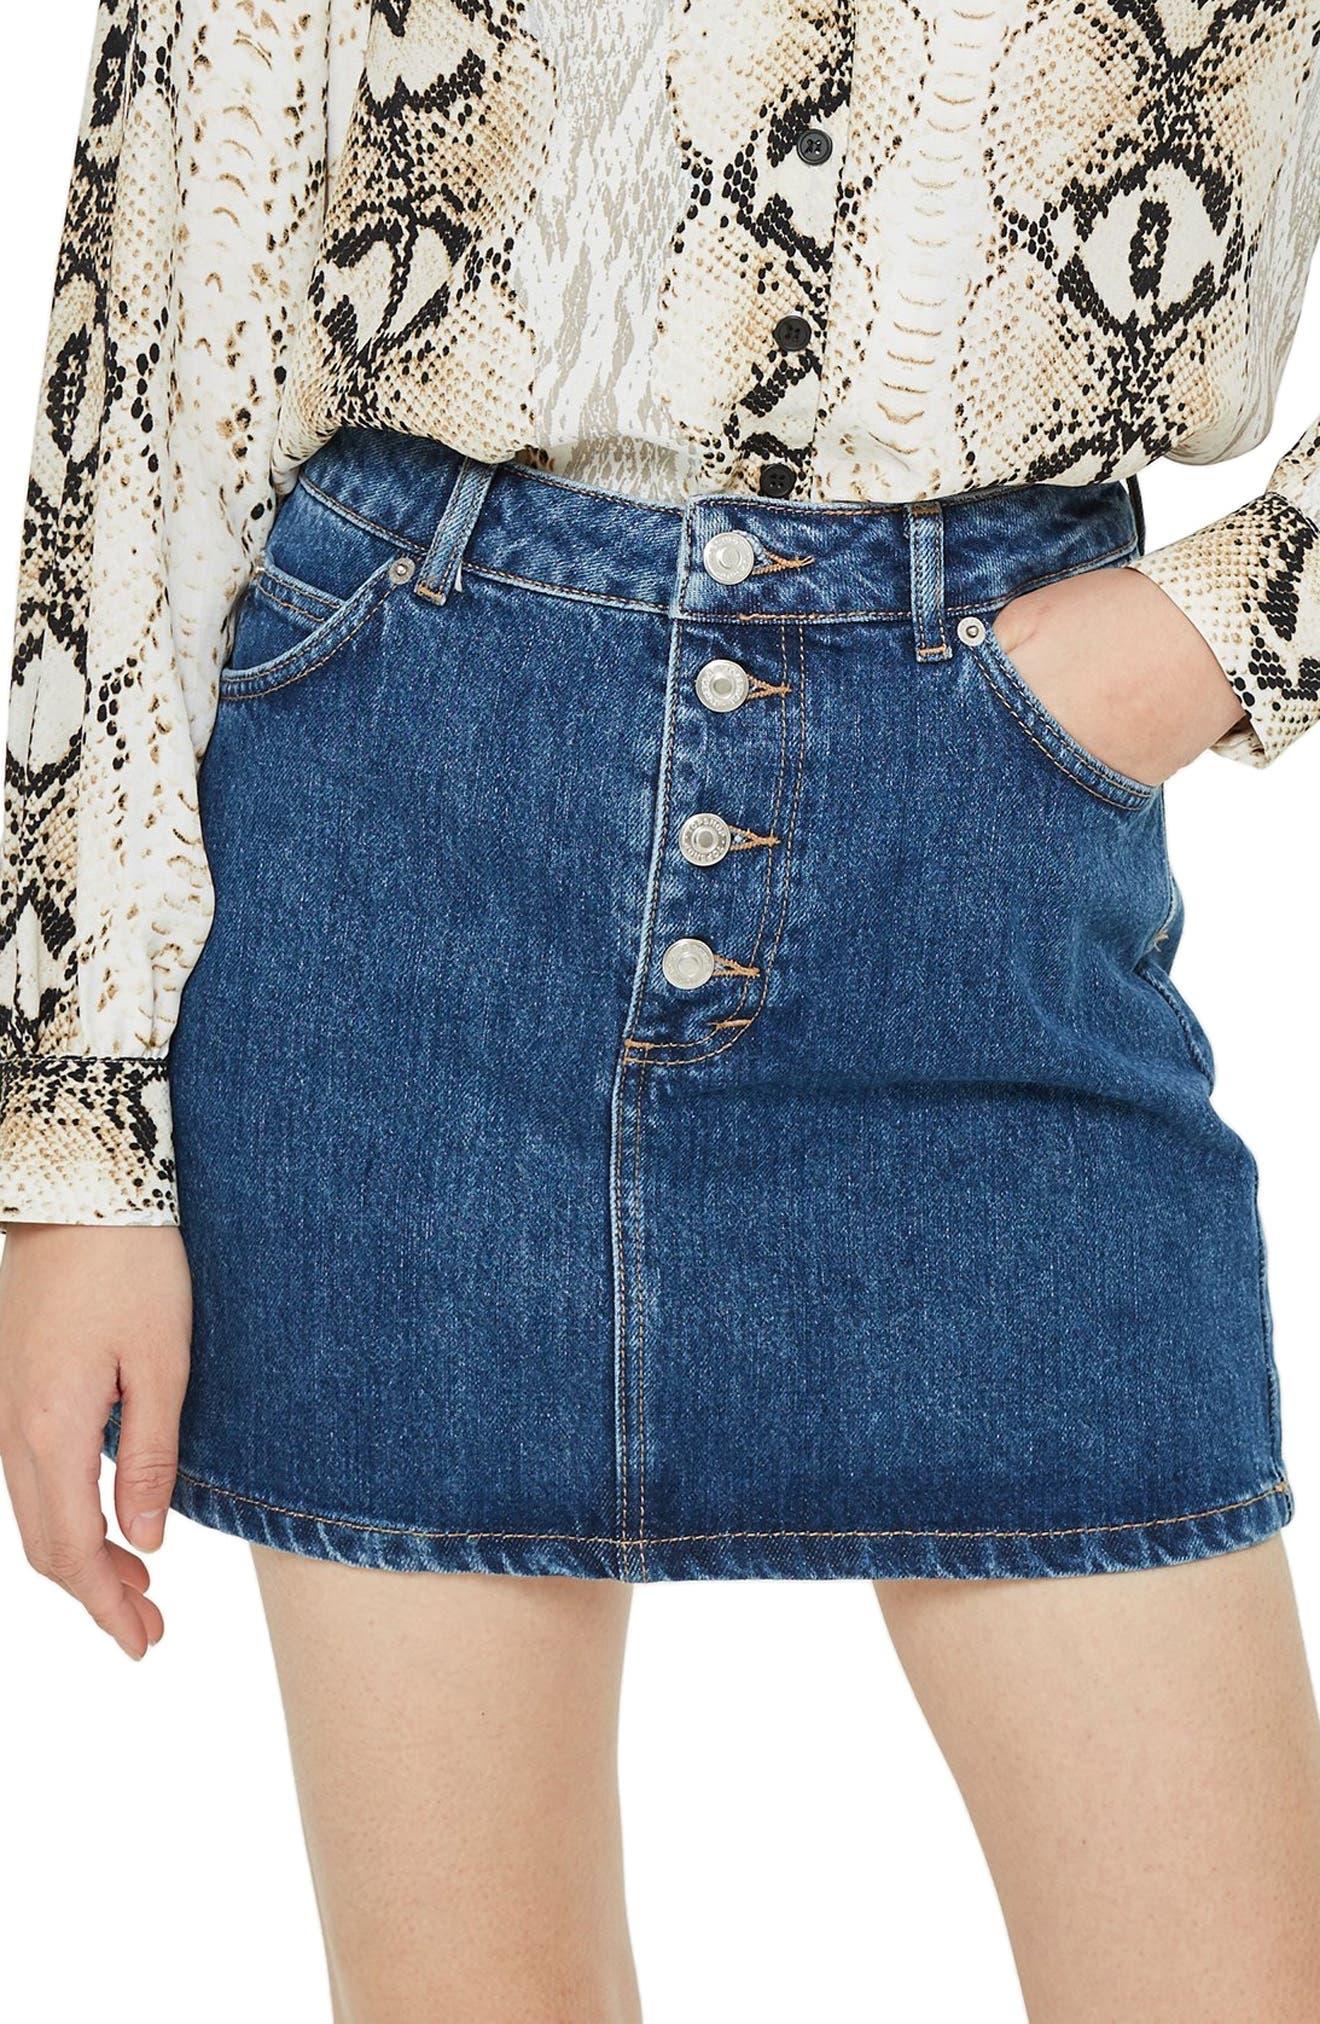 Topshop Button Fly Denim Skirt, US (fits like 16-18) - Blue